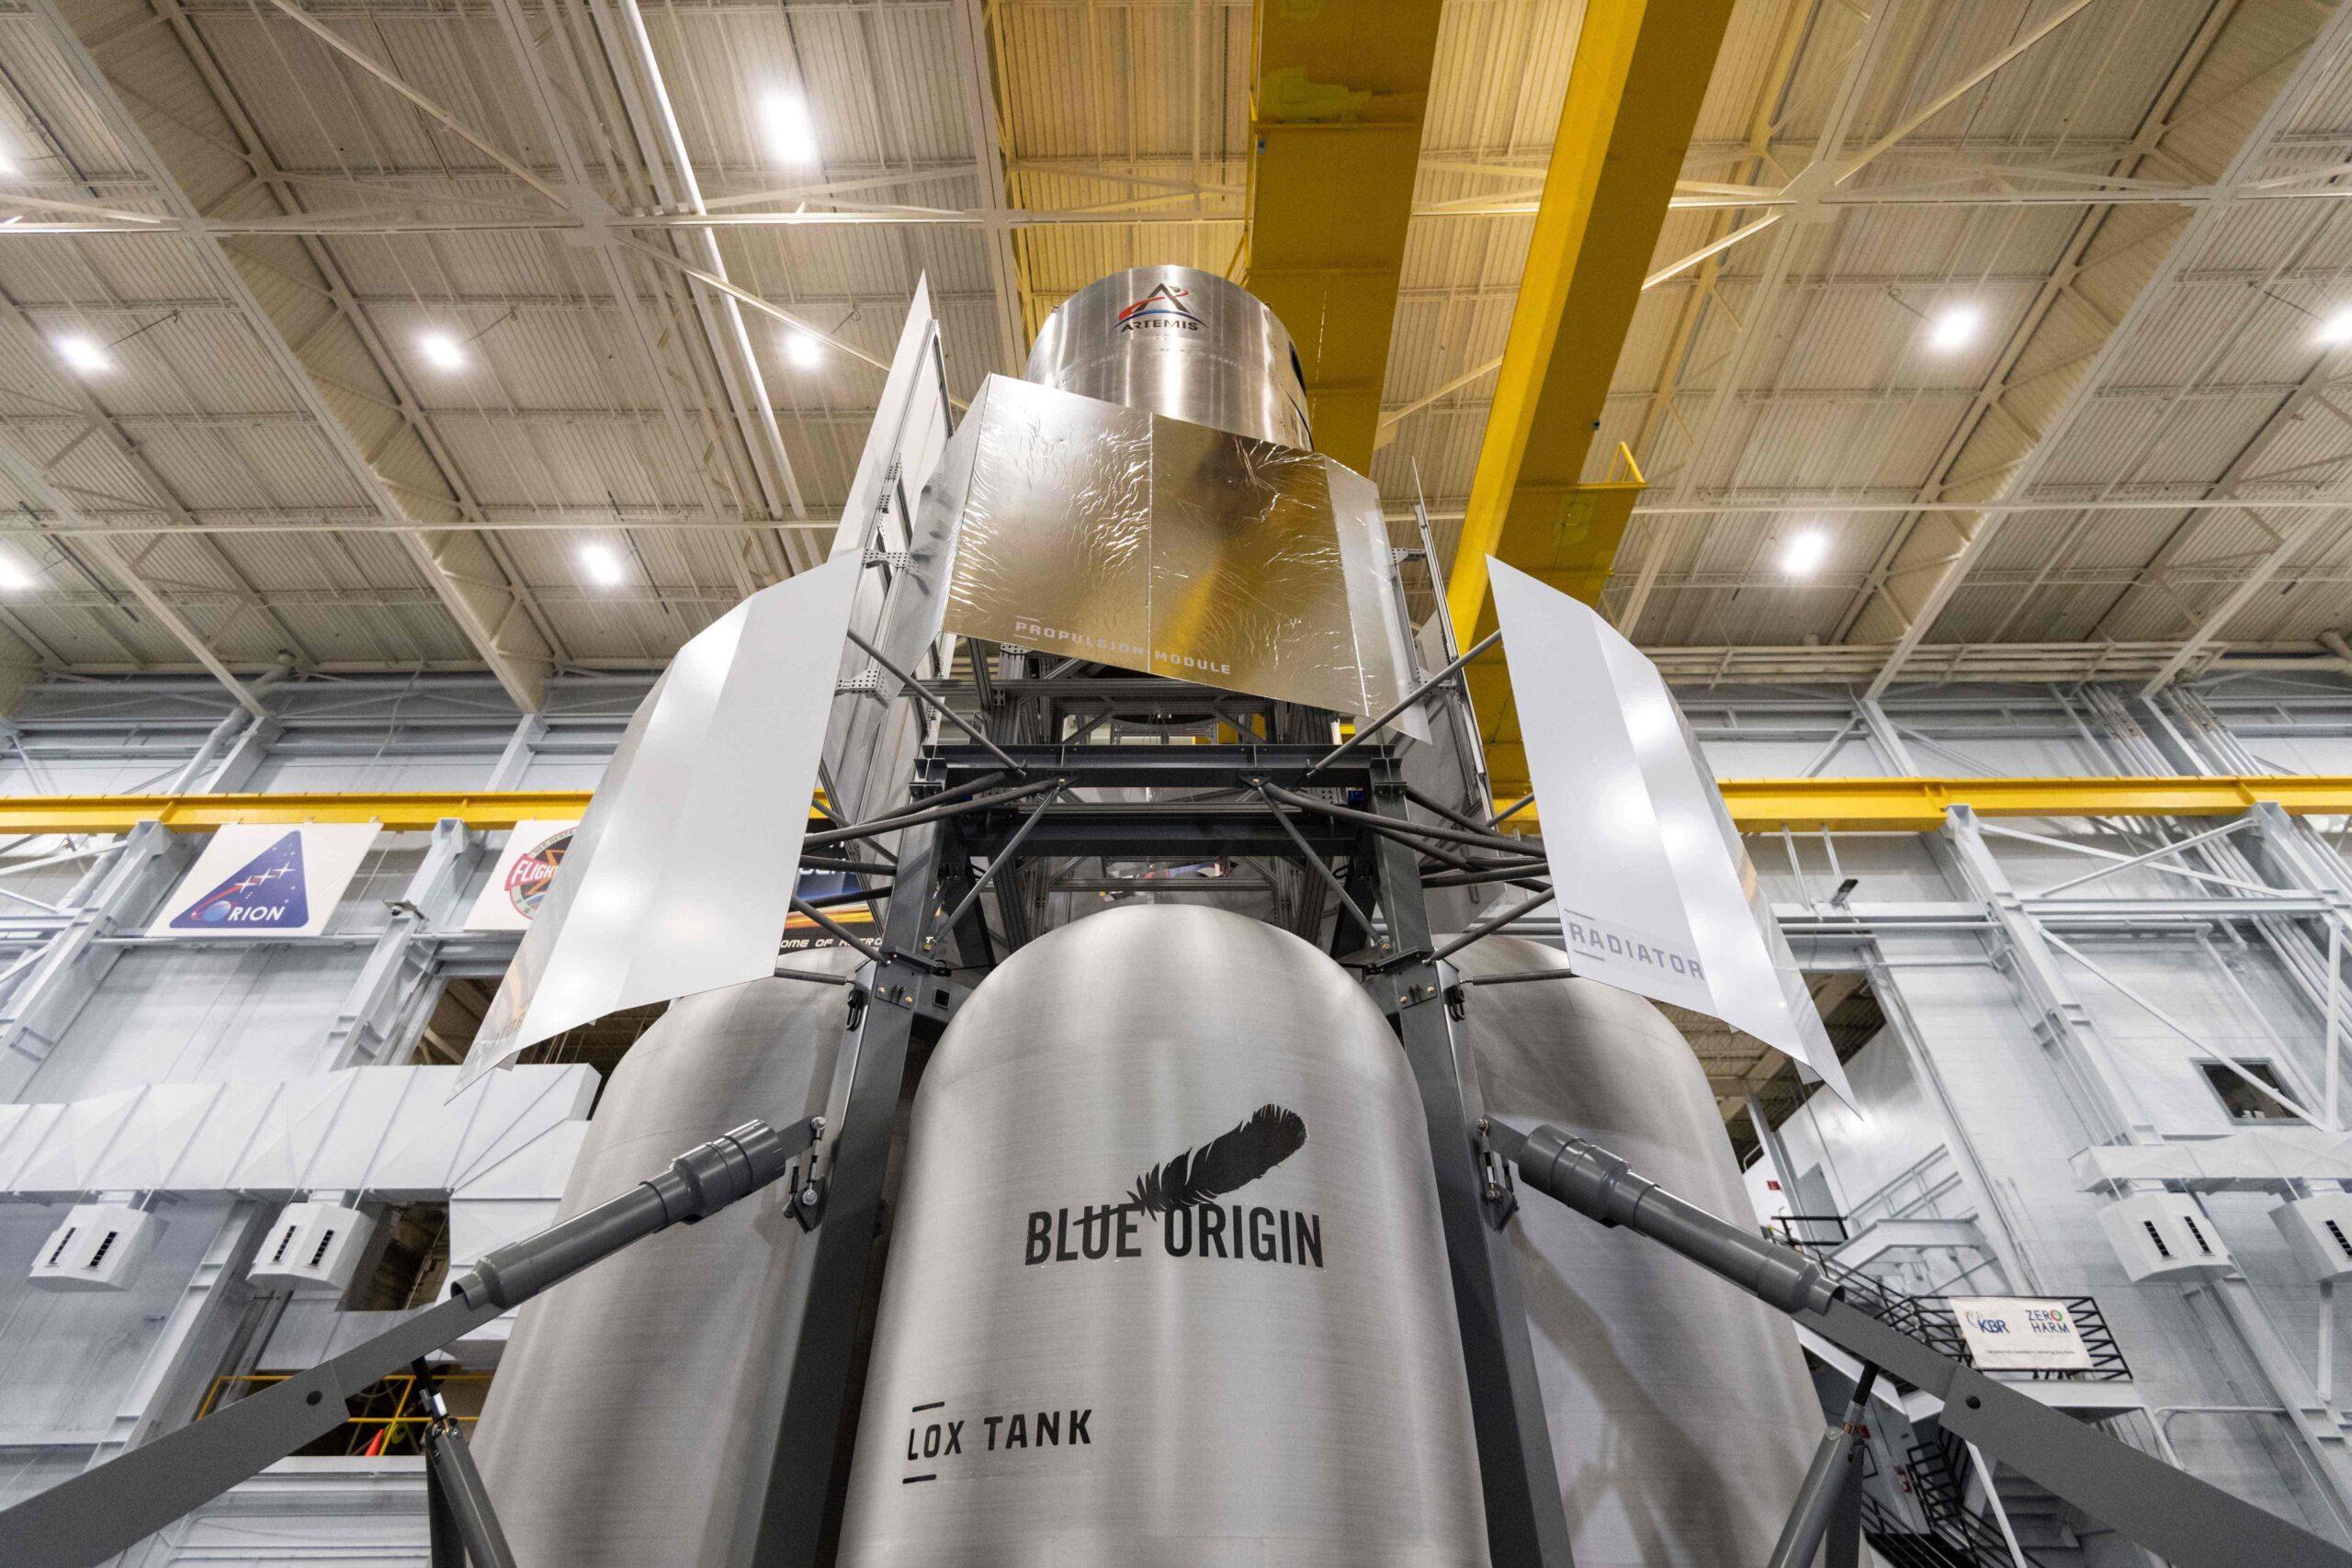 Blue Origin, Lockheed Martin, Northrop Grumman, and Draper — NationalTeam-Mockup-JSC-2